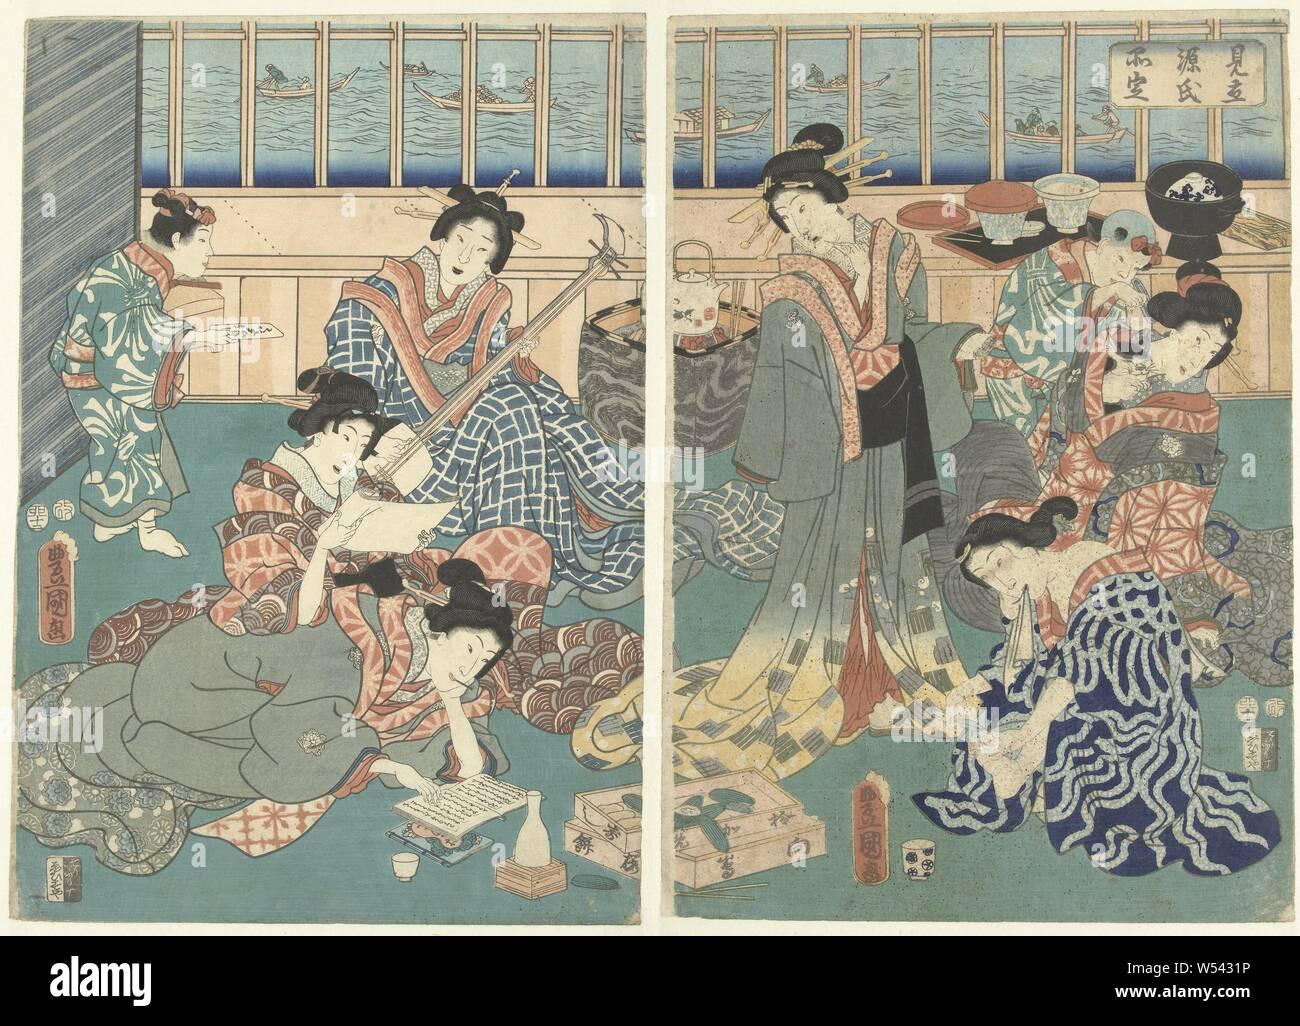 A contemporary version of the Genji story Mitate Genji